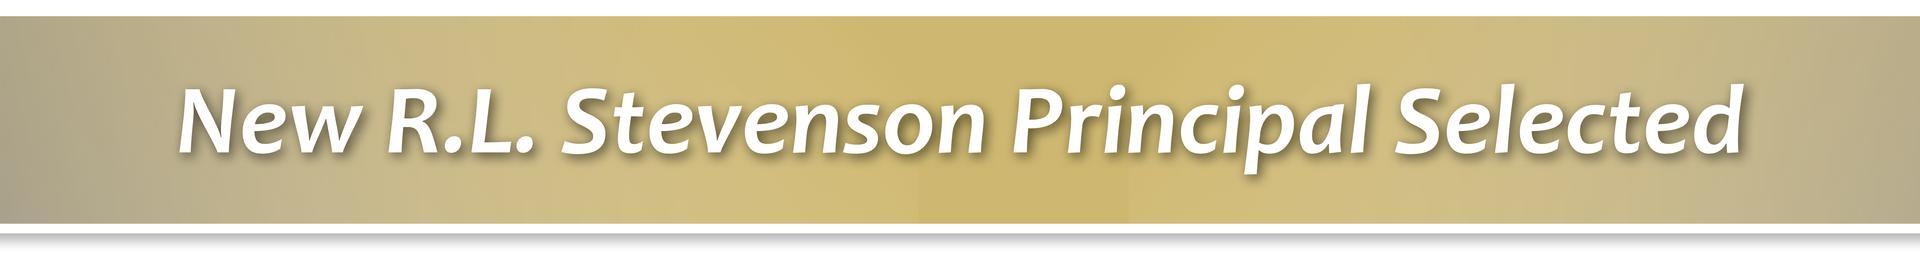 R.L. Stevenson Principal Selected